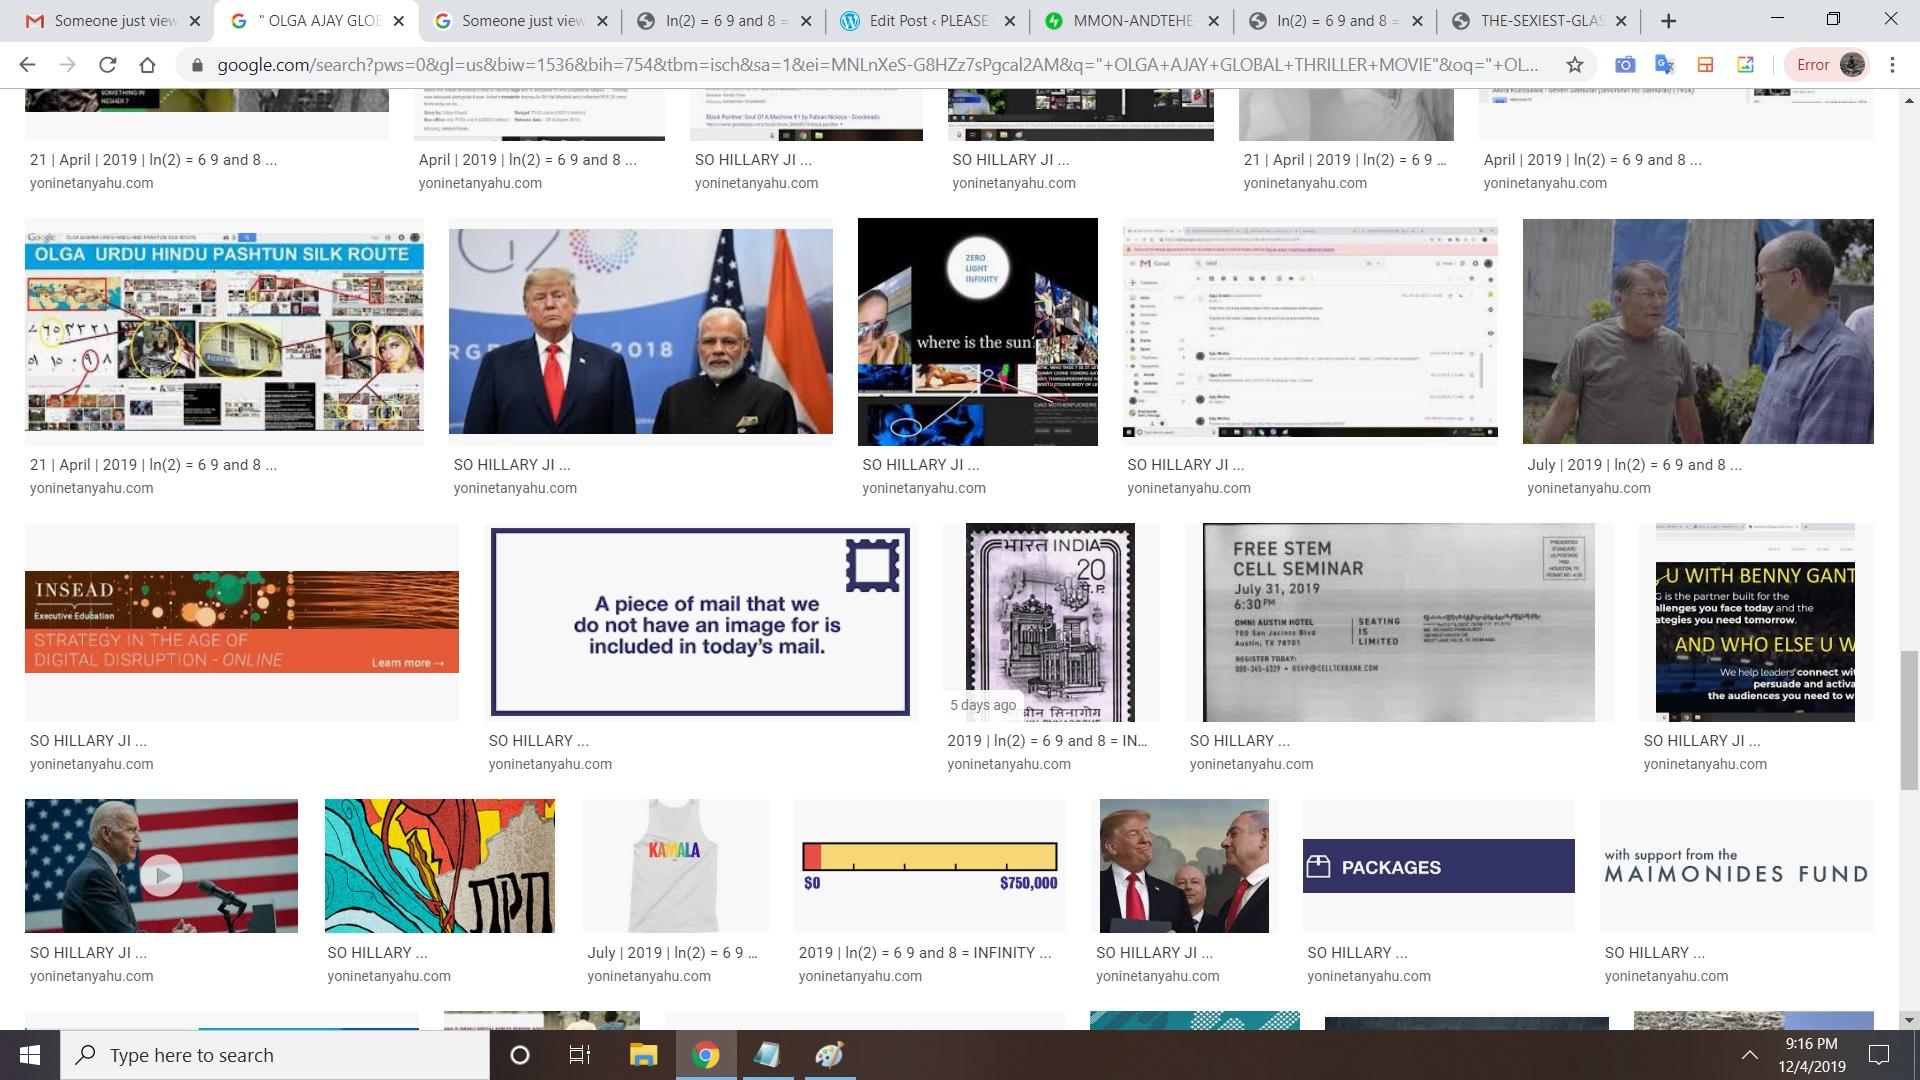 OLGA AJAY GLOBAL THRLELR MOVIE --- - Copy